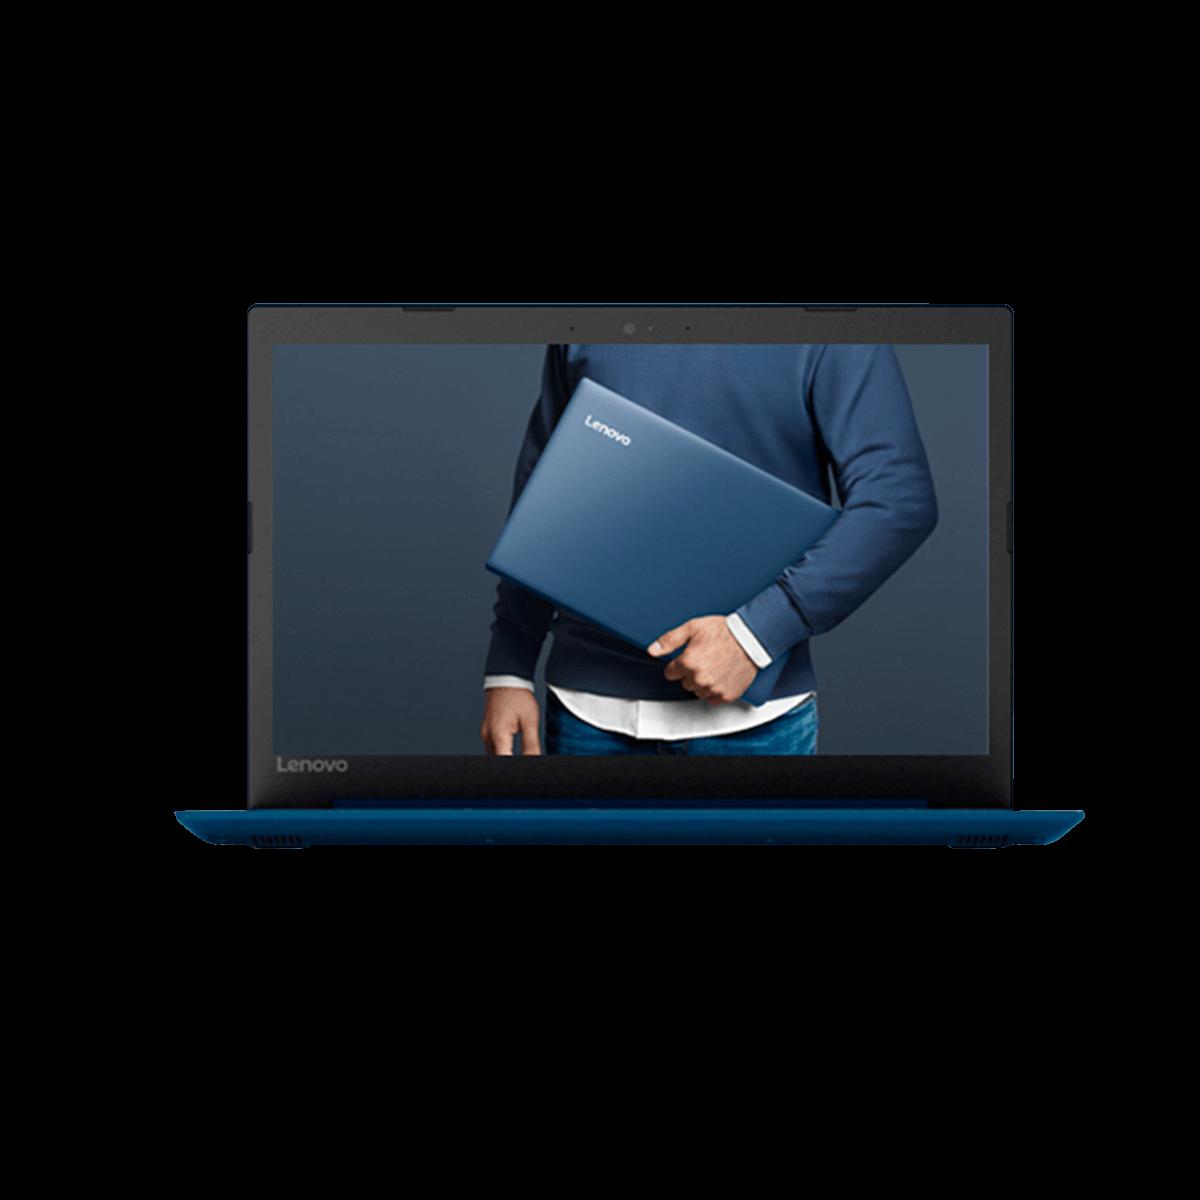 Lenovo Ideapad 330-14IGM Intel N5000 Processor, 4GB RAM, 500GB Hard Disk  Drive, 14 inch HD Screen, Windows 10 Ready, 81D00040PH Mid Blue Color